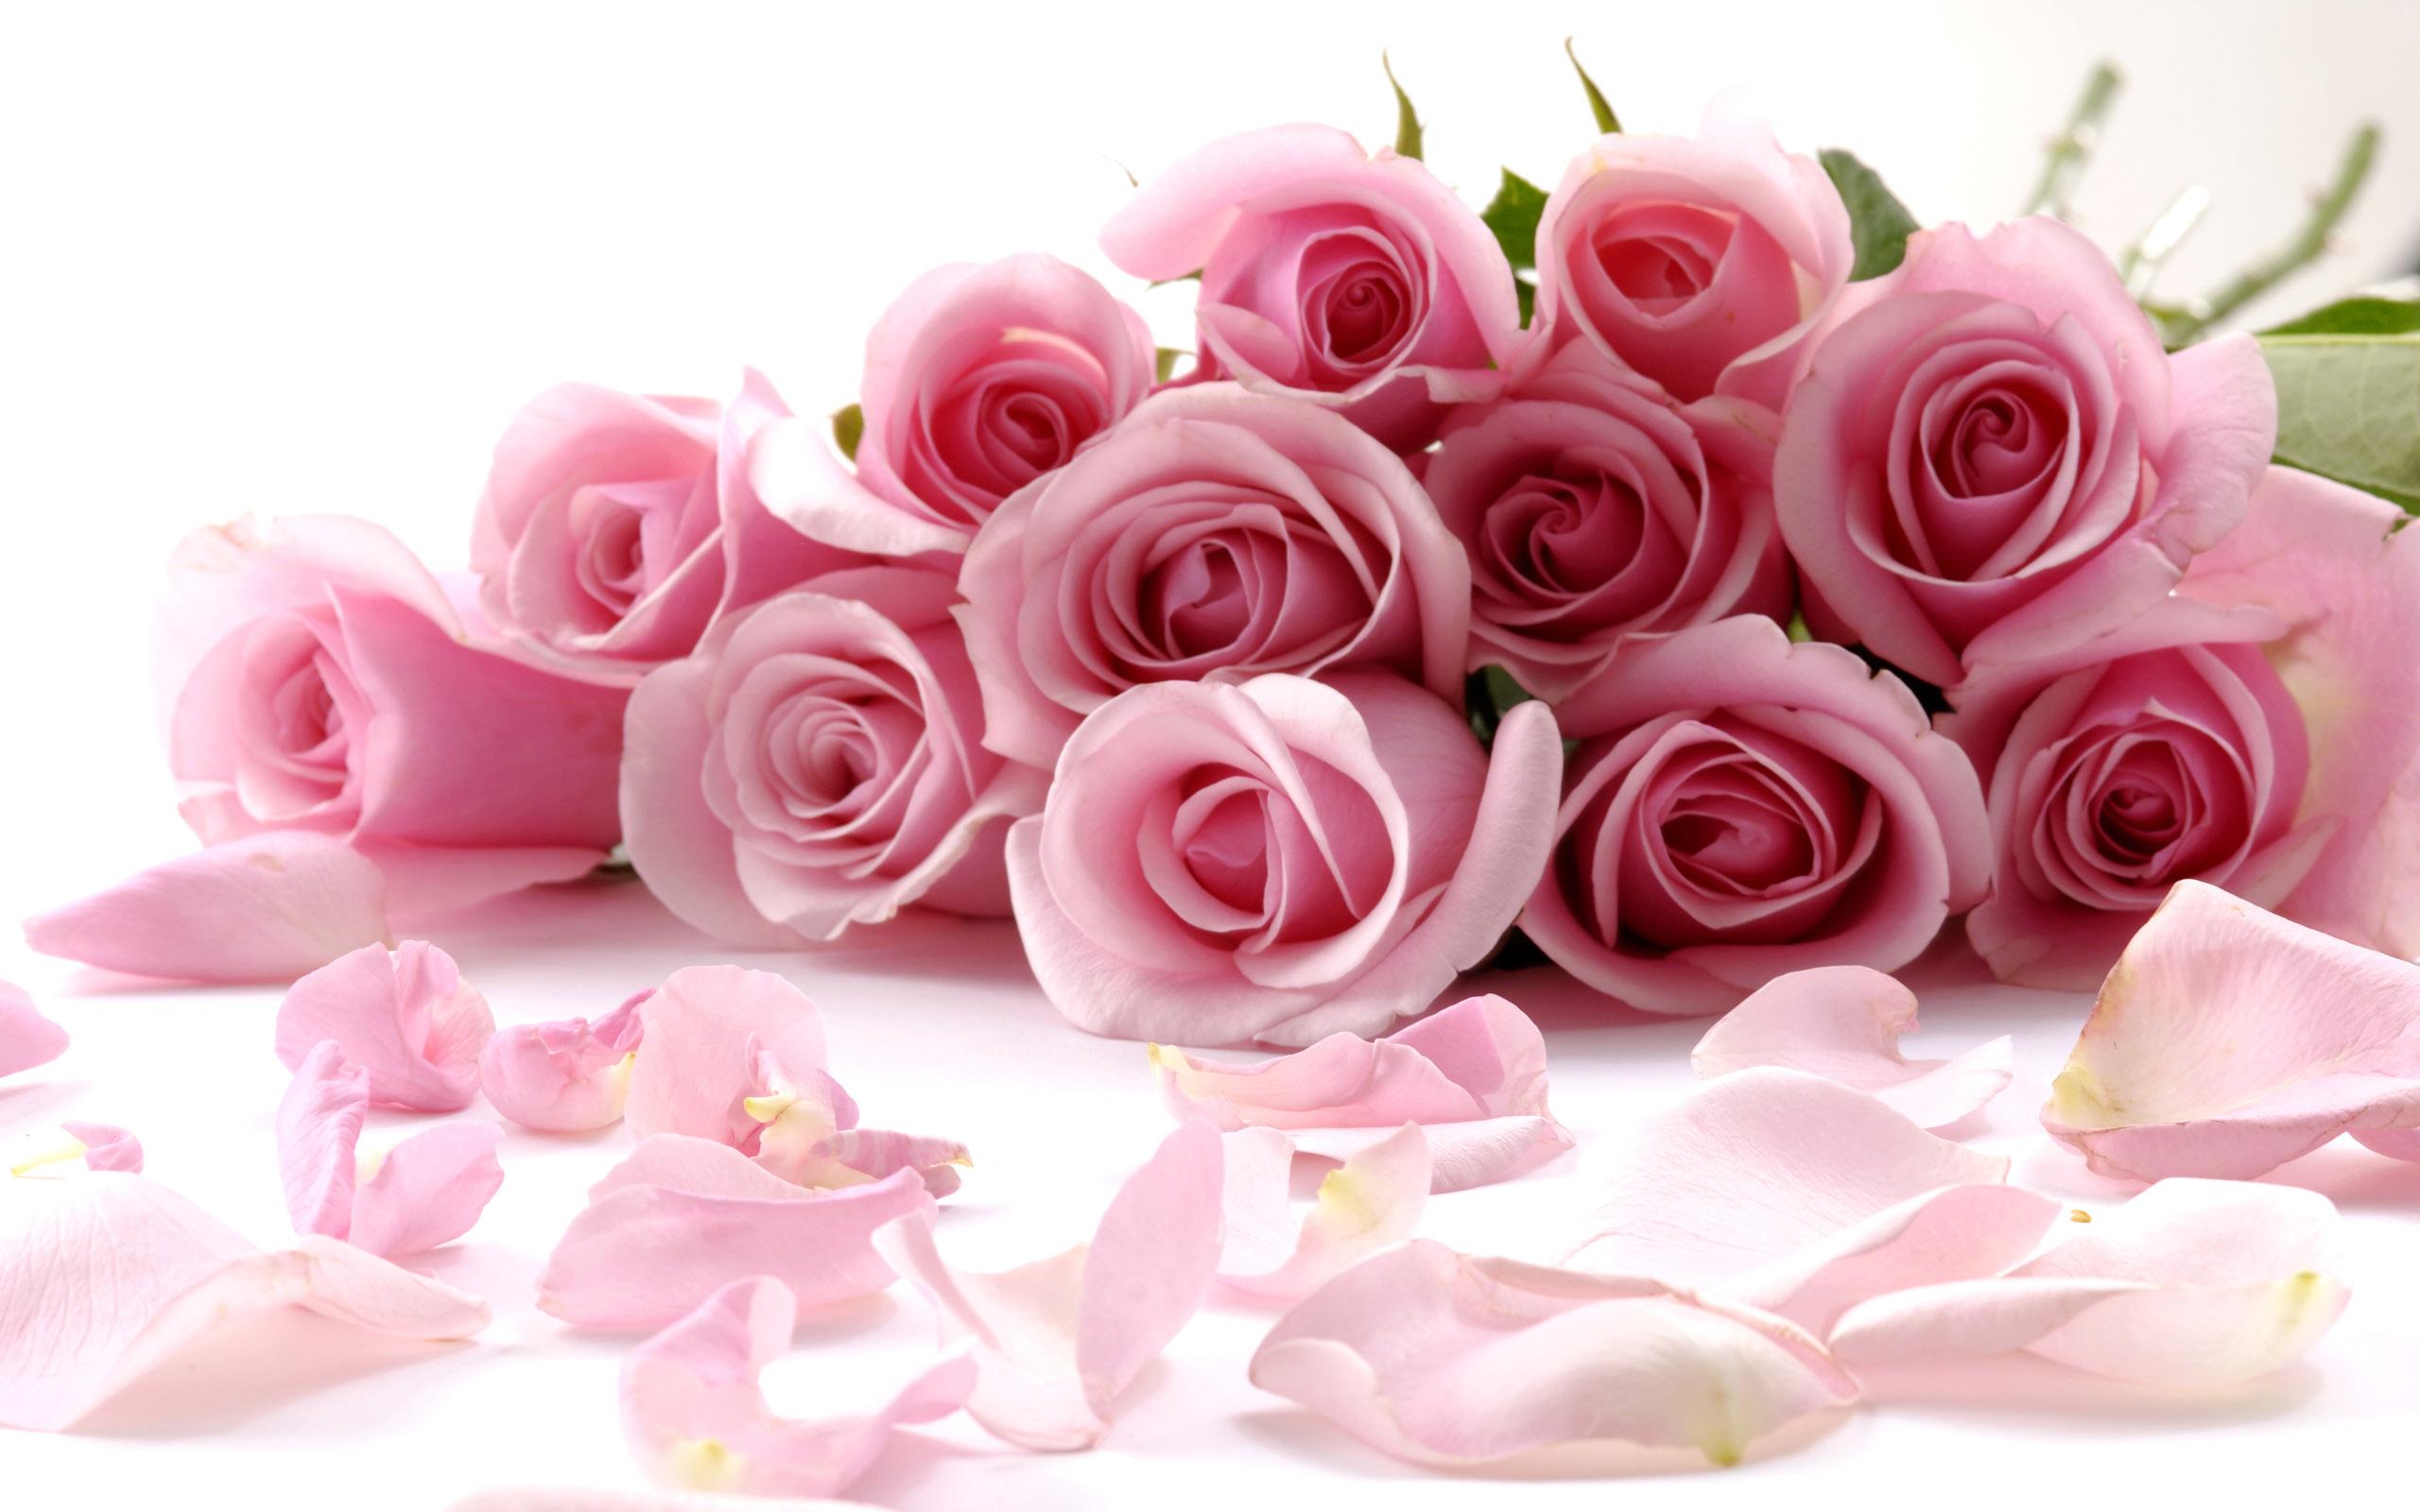 pink roses wallpapers – 2560 x 1600 pixels – 431 kB